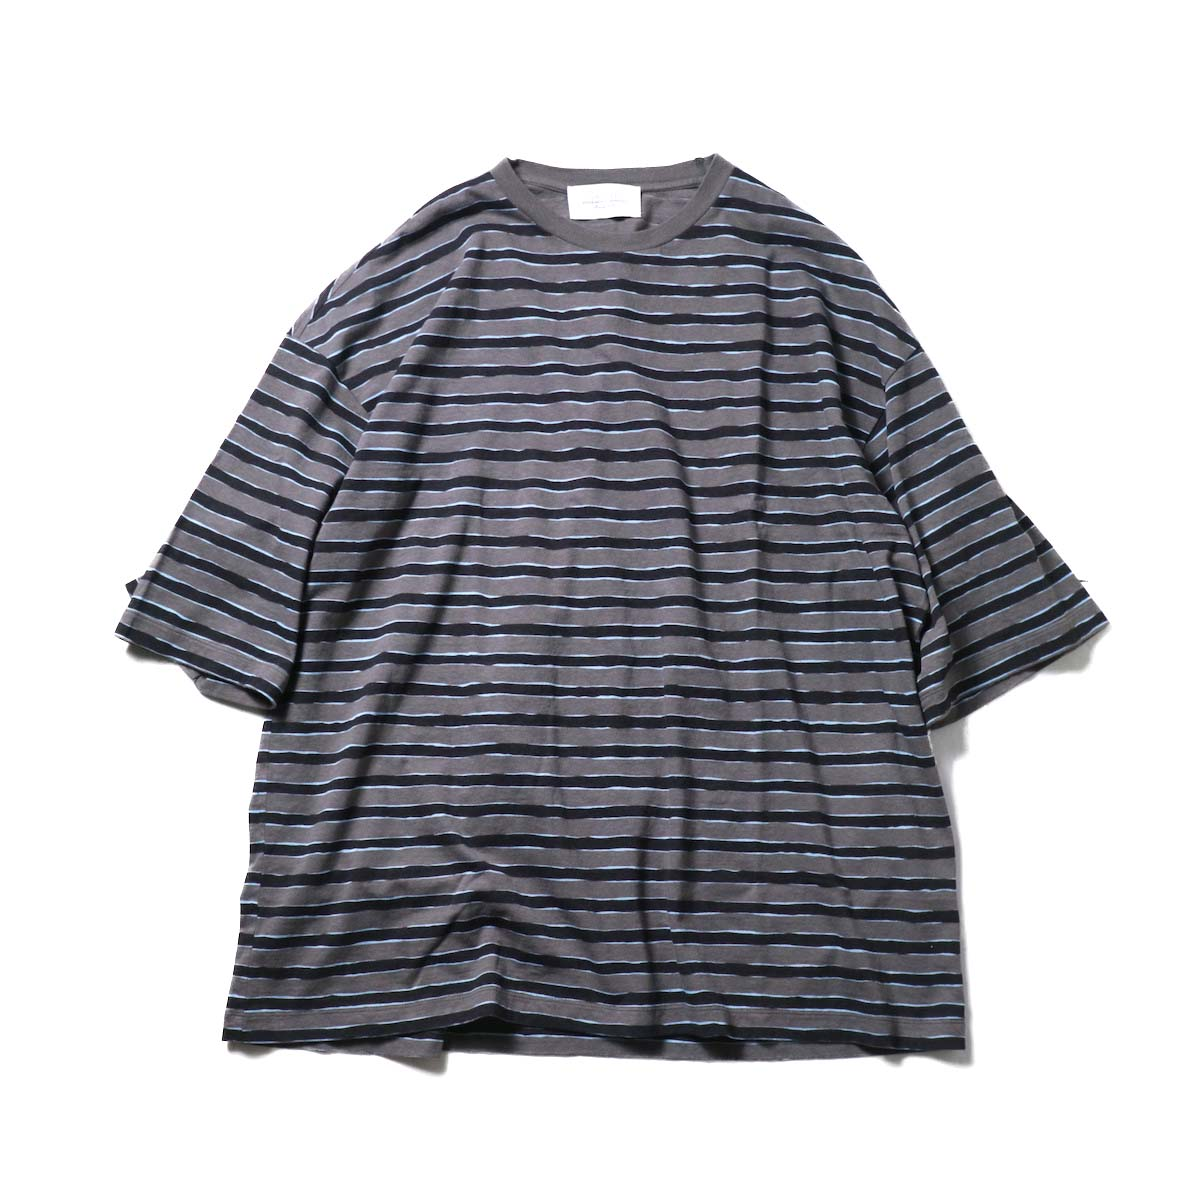 UNUSED / US2021 Short sleeve print border t-shirt (Charcoal × Black)